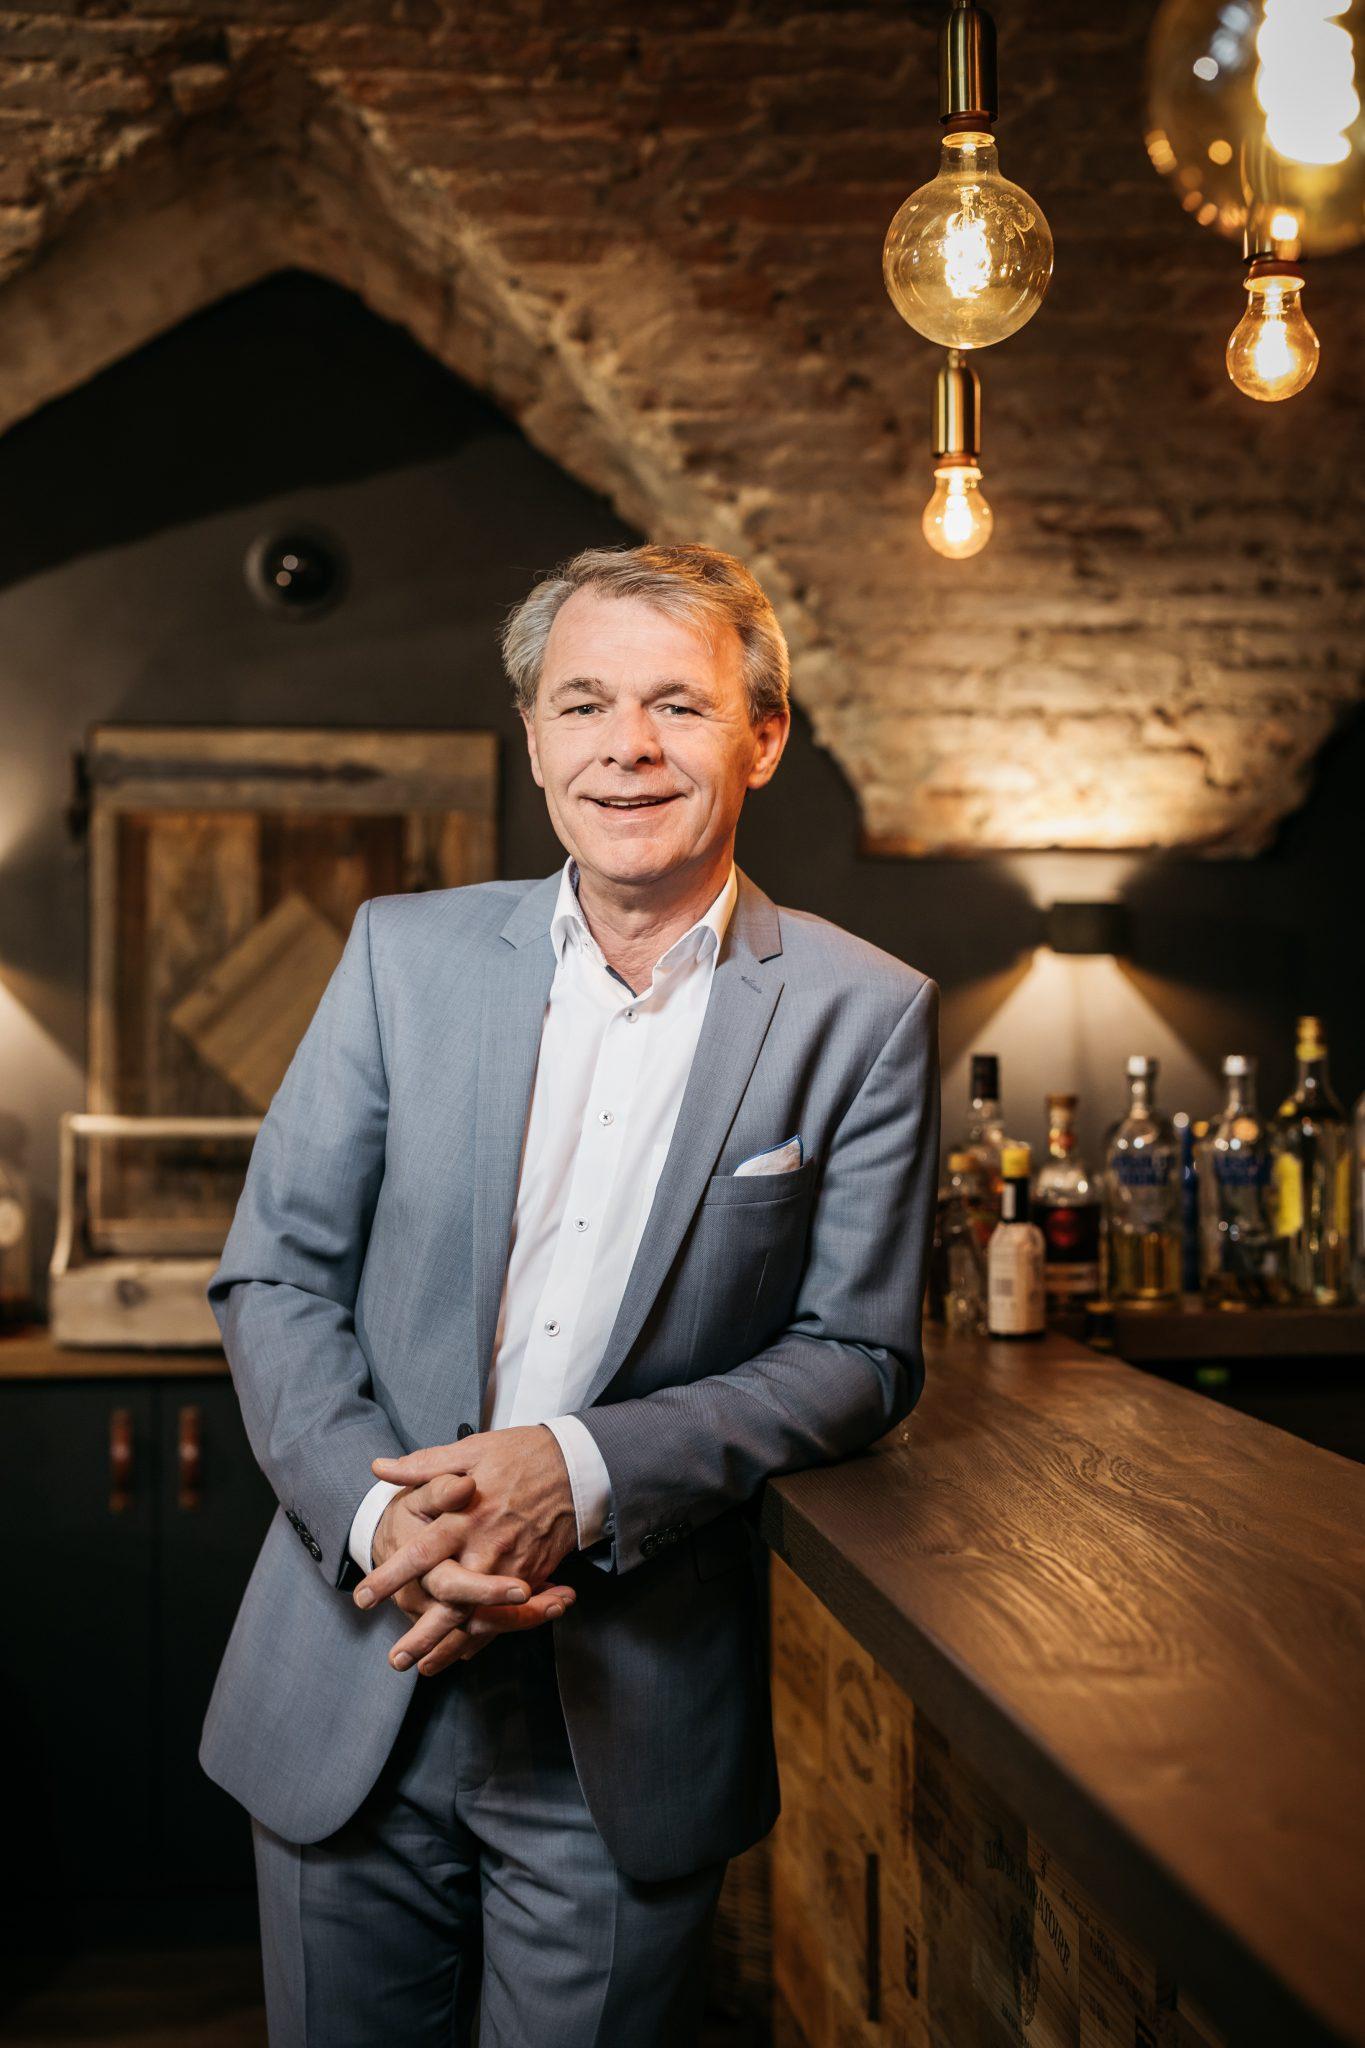 Thomas Edelkamp, Vorstandsvorsitzender der Romantik Hotels & Restaurants AG, Bad Aibling, 10.2.2020, Foto: Thorsten Jochim